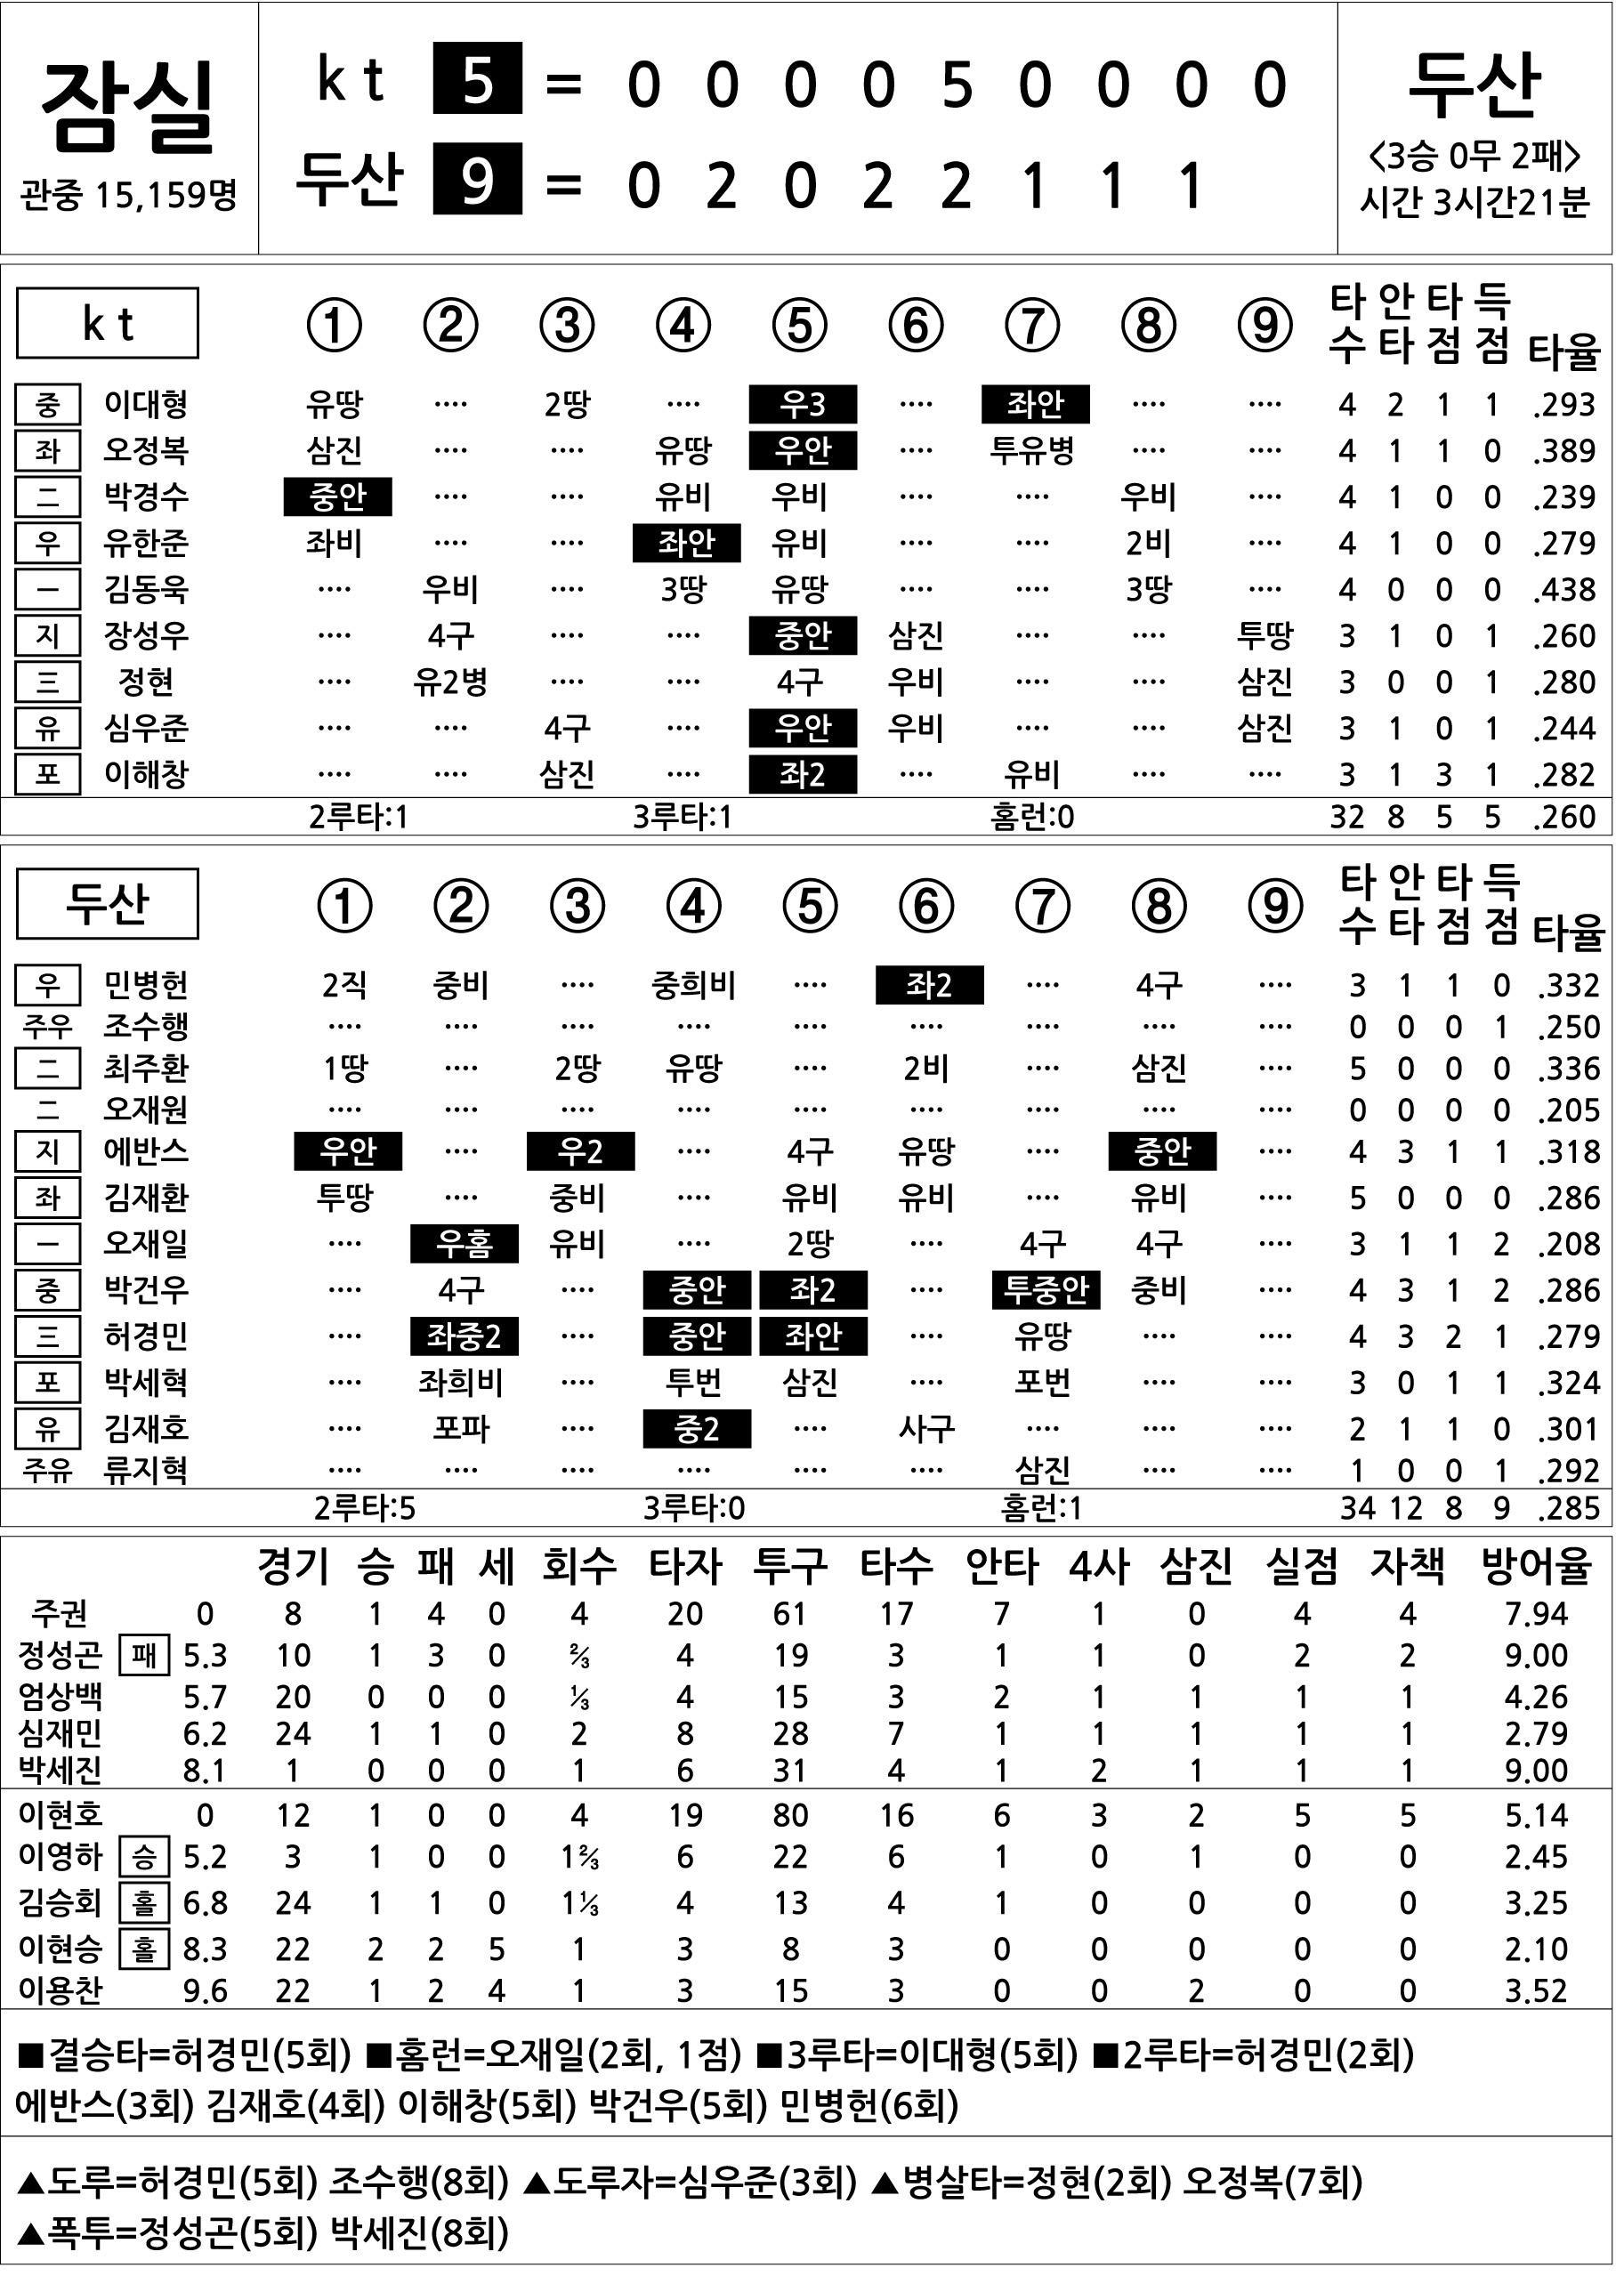 [2017 KBO리그 기록실] kt vs 두산 (5월 28일)